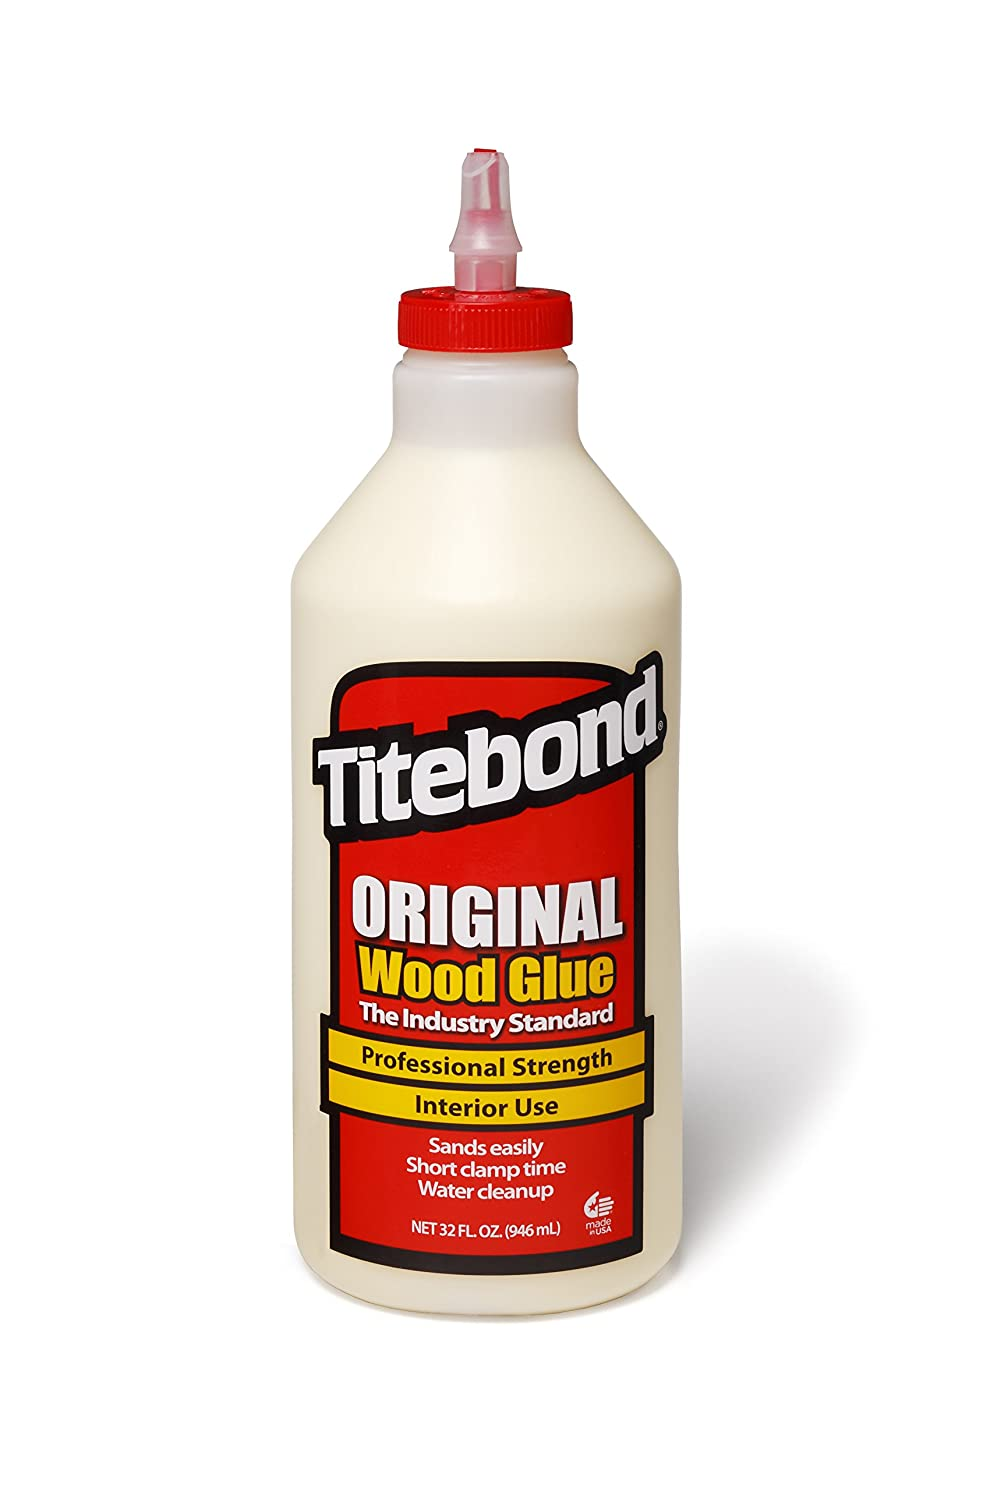 Titebond Original Wood Glue, 1-Quart #5065 qr948234009861